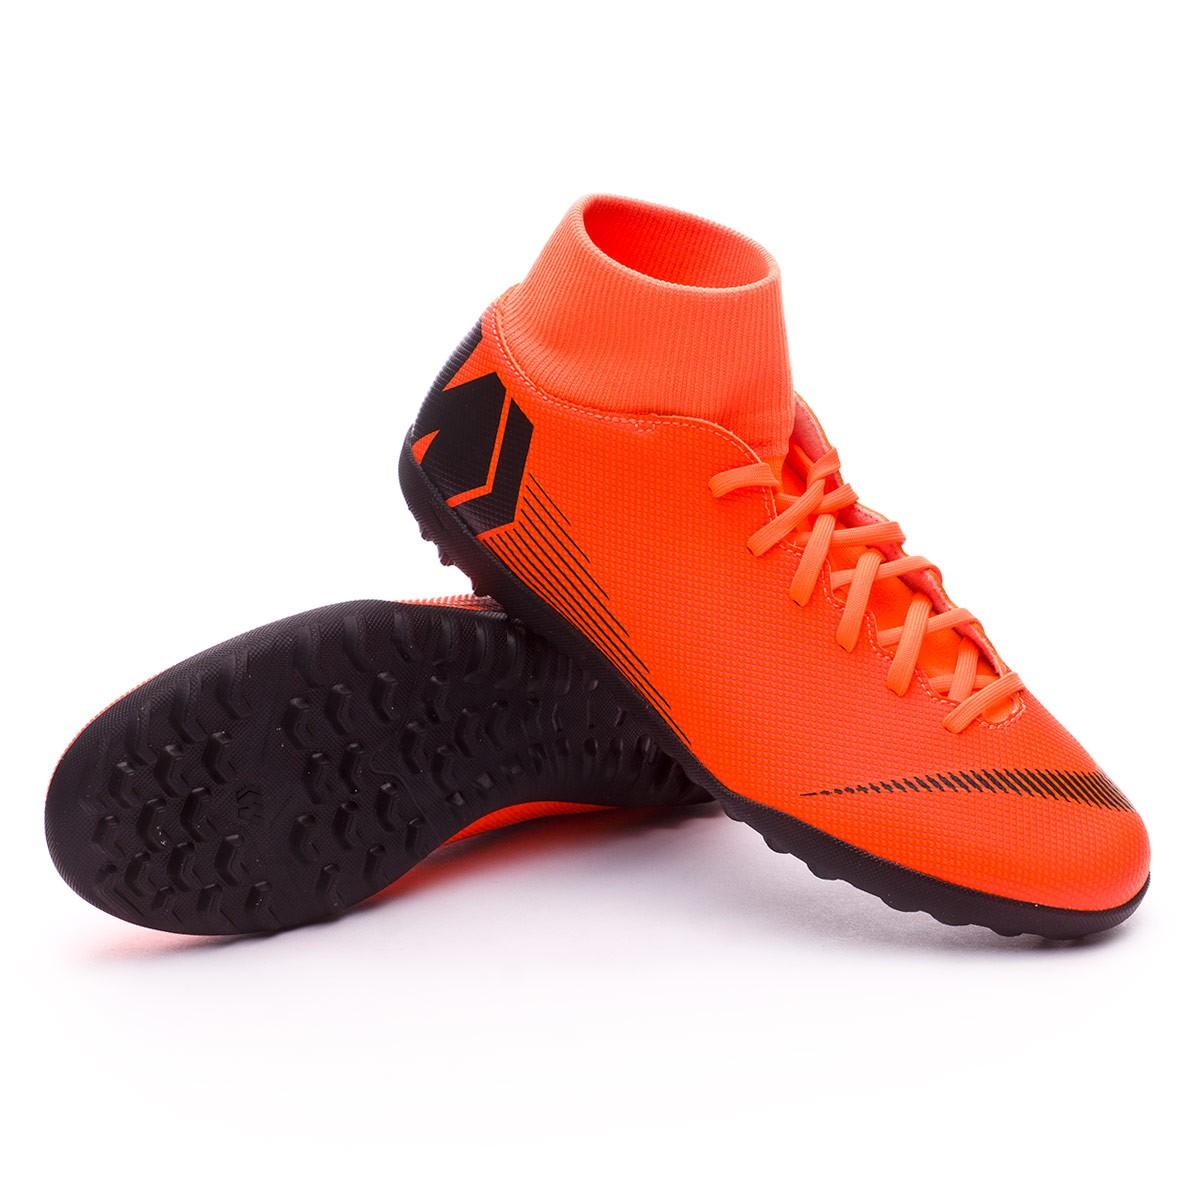 info for 26e8d f1482 Zapatilla Mercurial SuperflyX VI Club Turf Total orange-Black-Volt